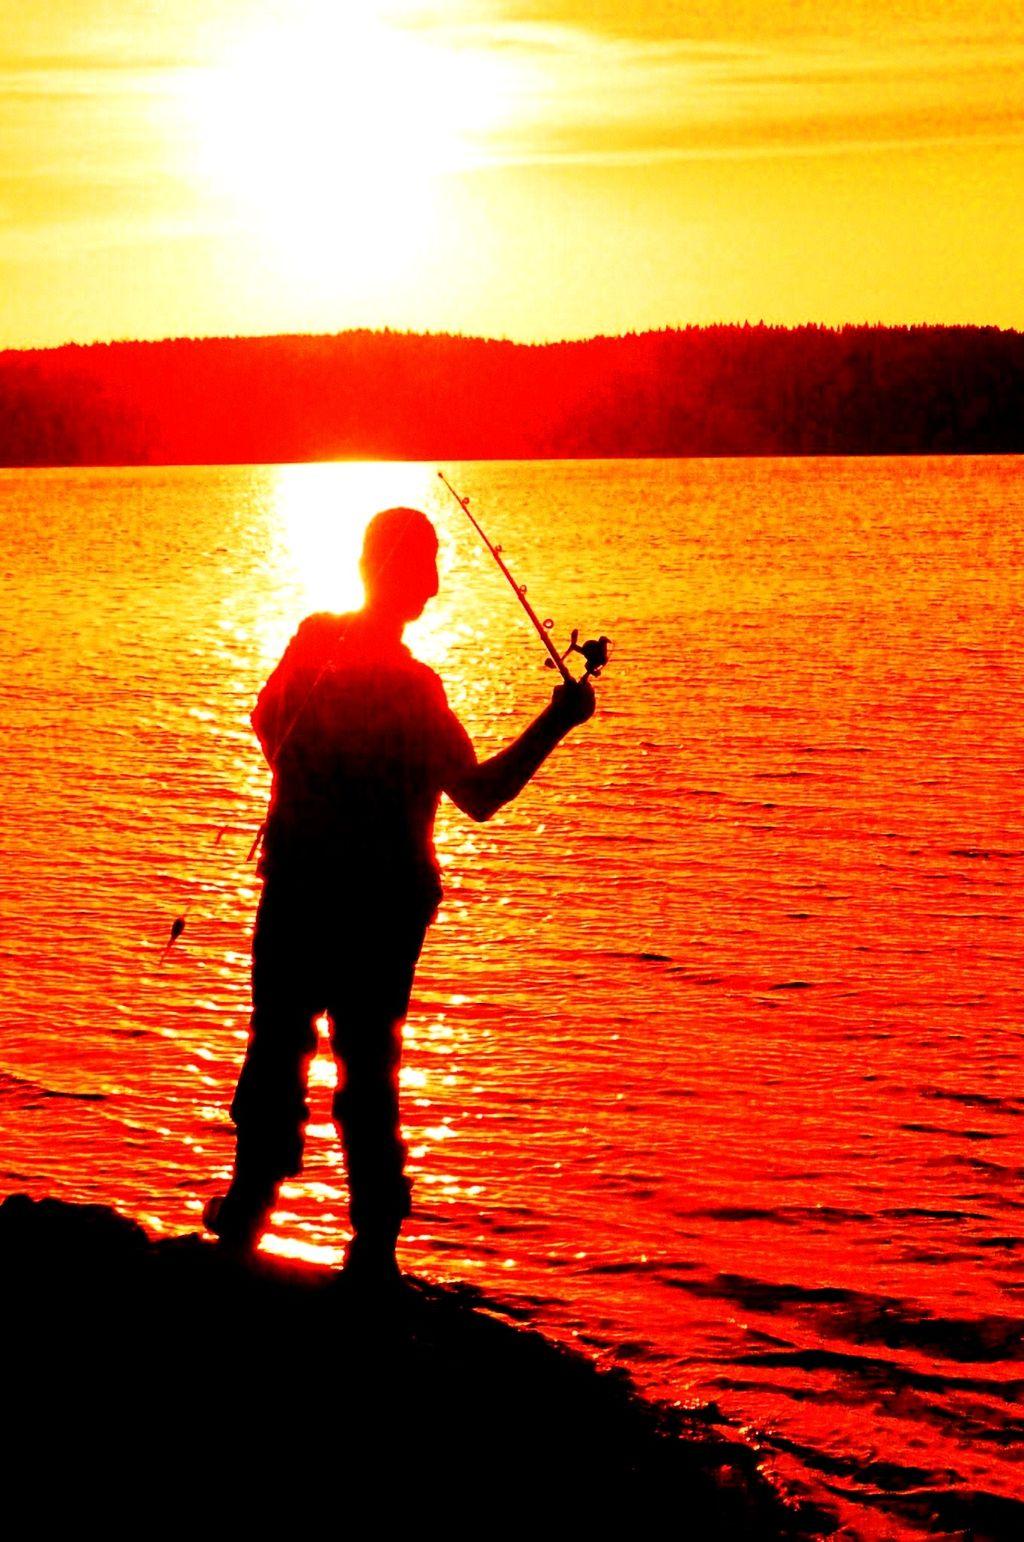 Название: рыбалка на закате.JPG Просмотров: 273  Размер: 253.8 Кб